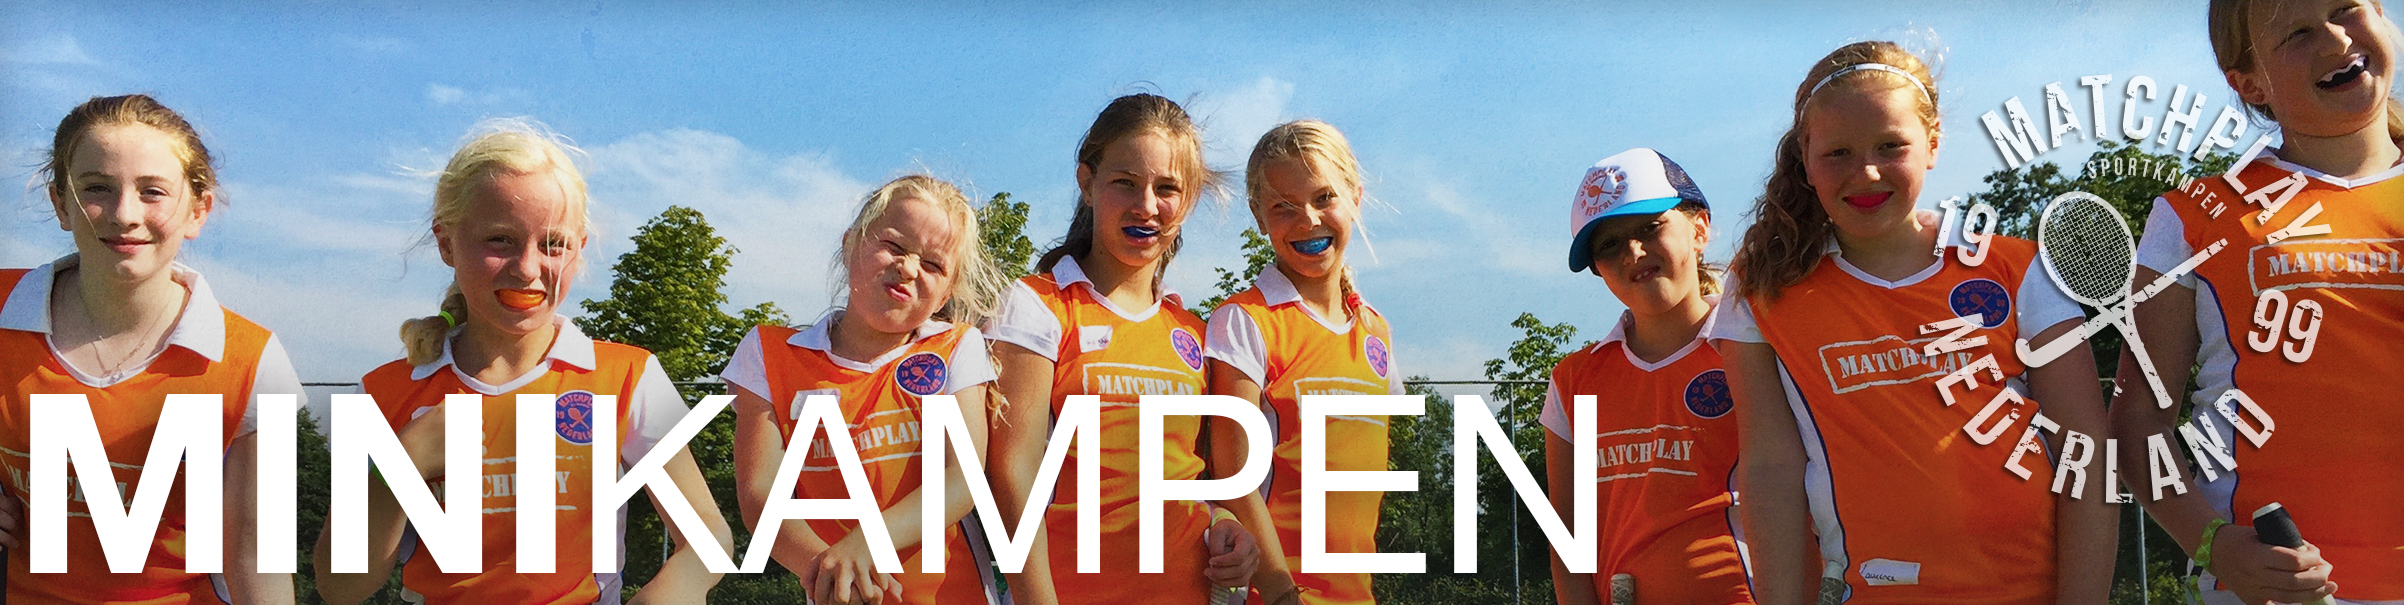 Site-banner-Hockey-Minikampen-1